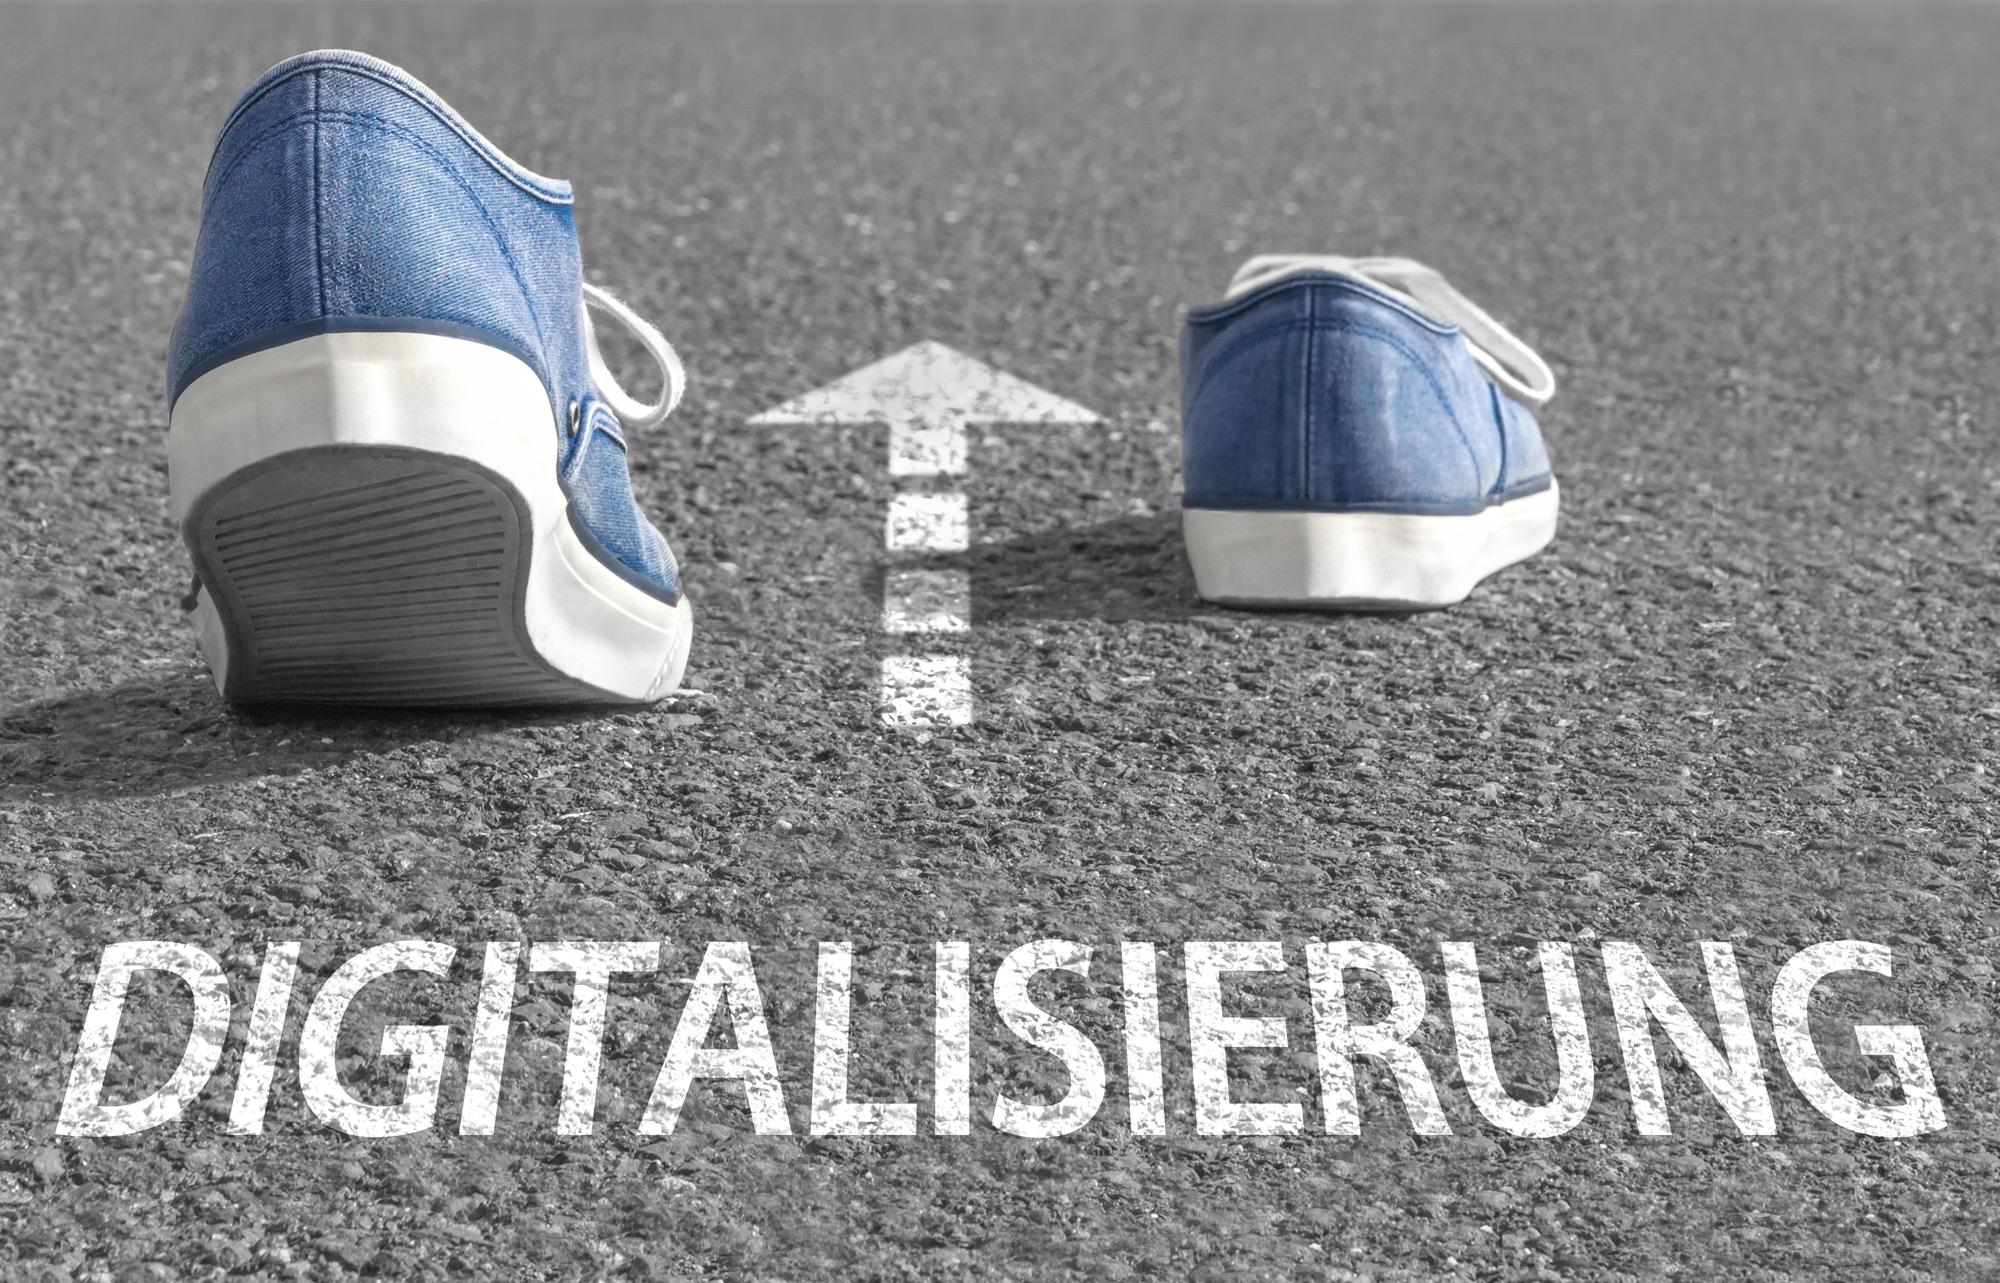 matchpilot Webcast: Digitalisierungprojekte voranbringen